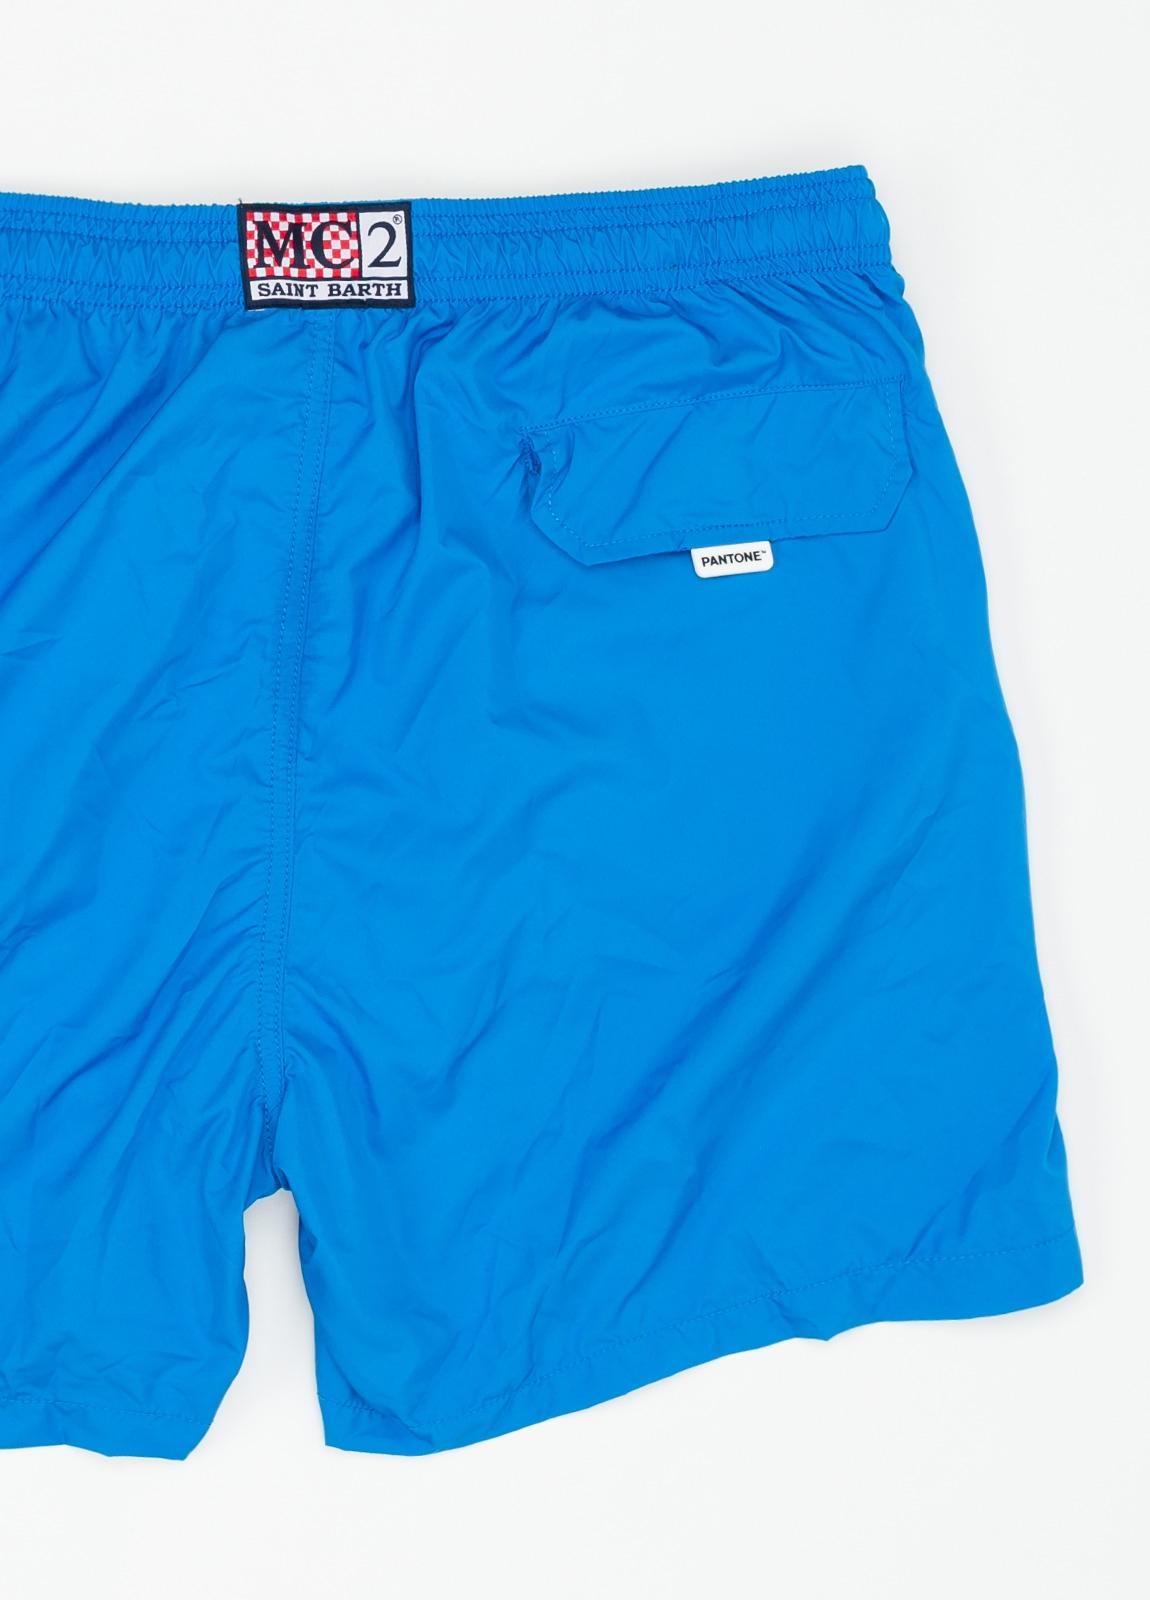 Bañador liso modelo SUPREME color azul, microfibra. - Ítem1